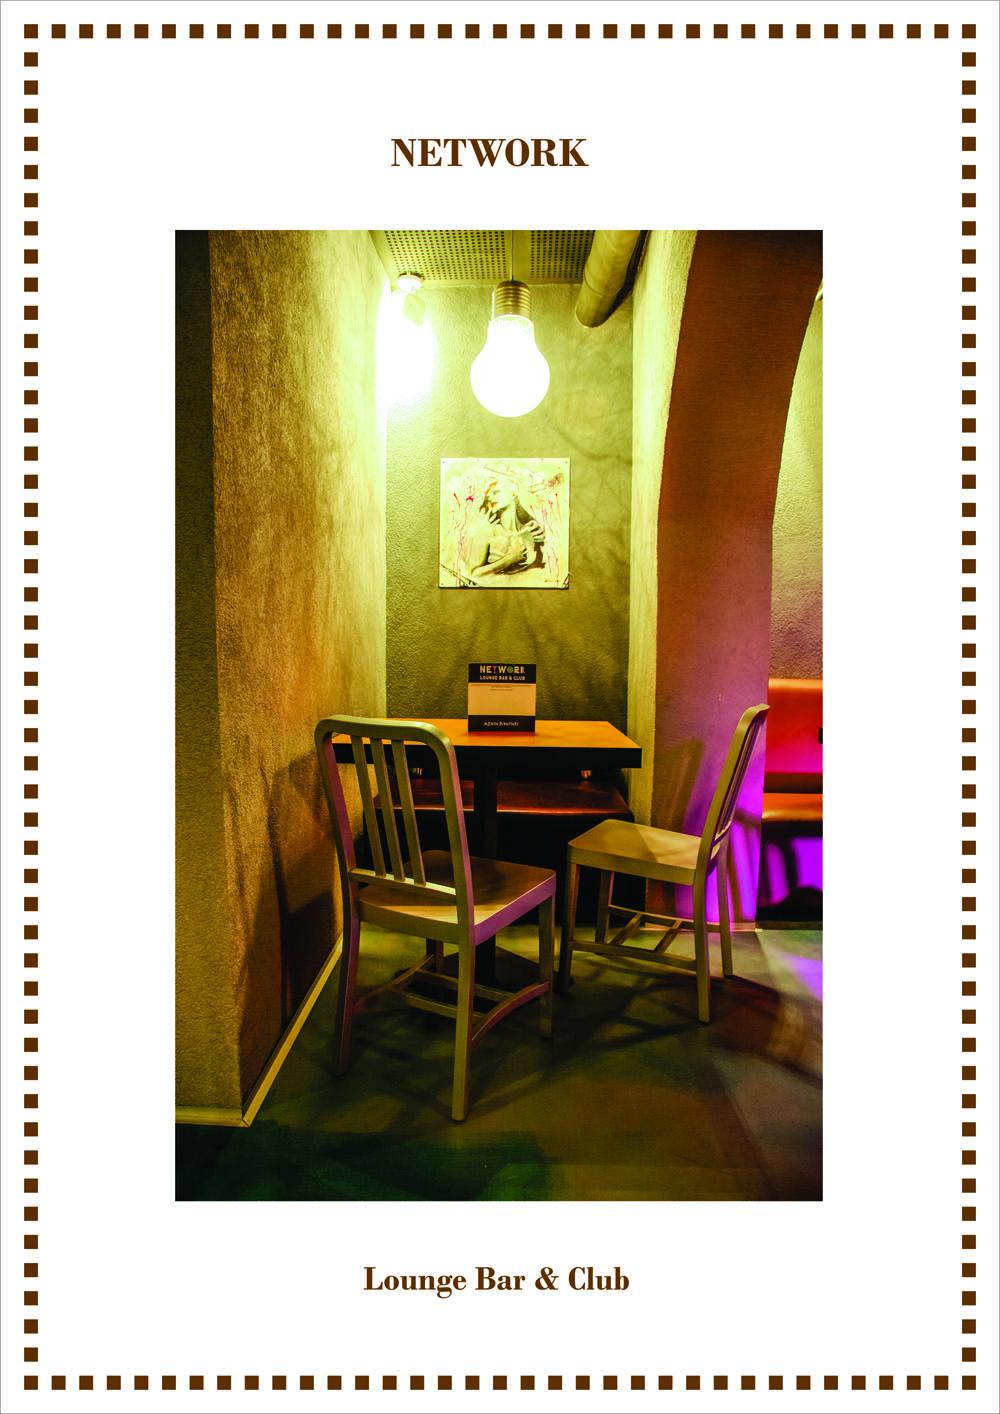 Network Lounge Bar&Club, Bucuresti  - Poza 3